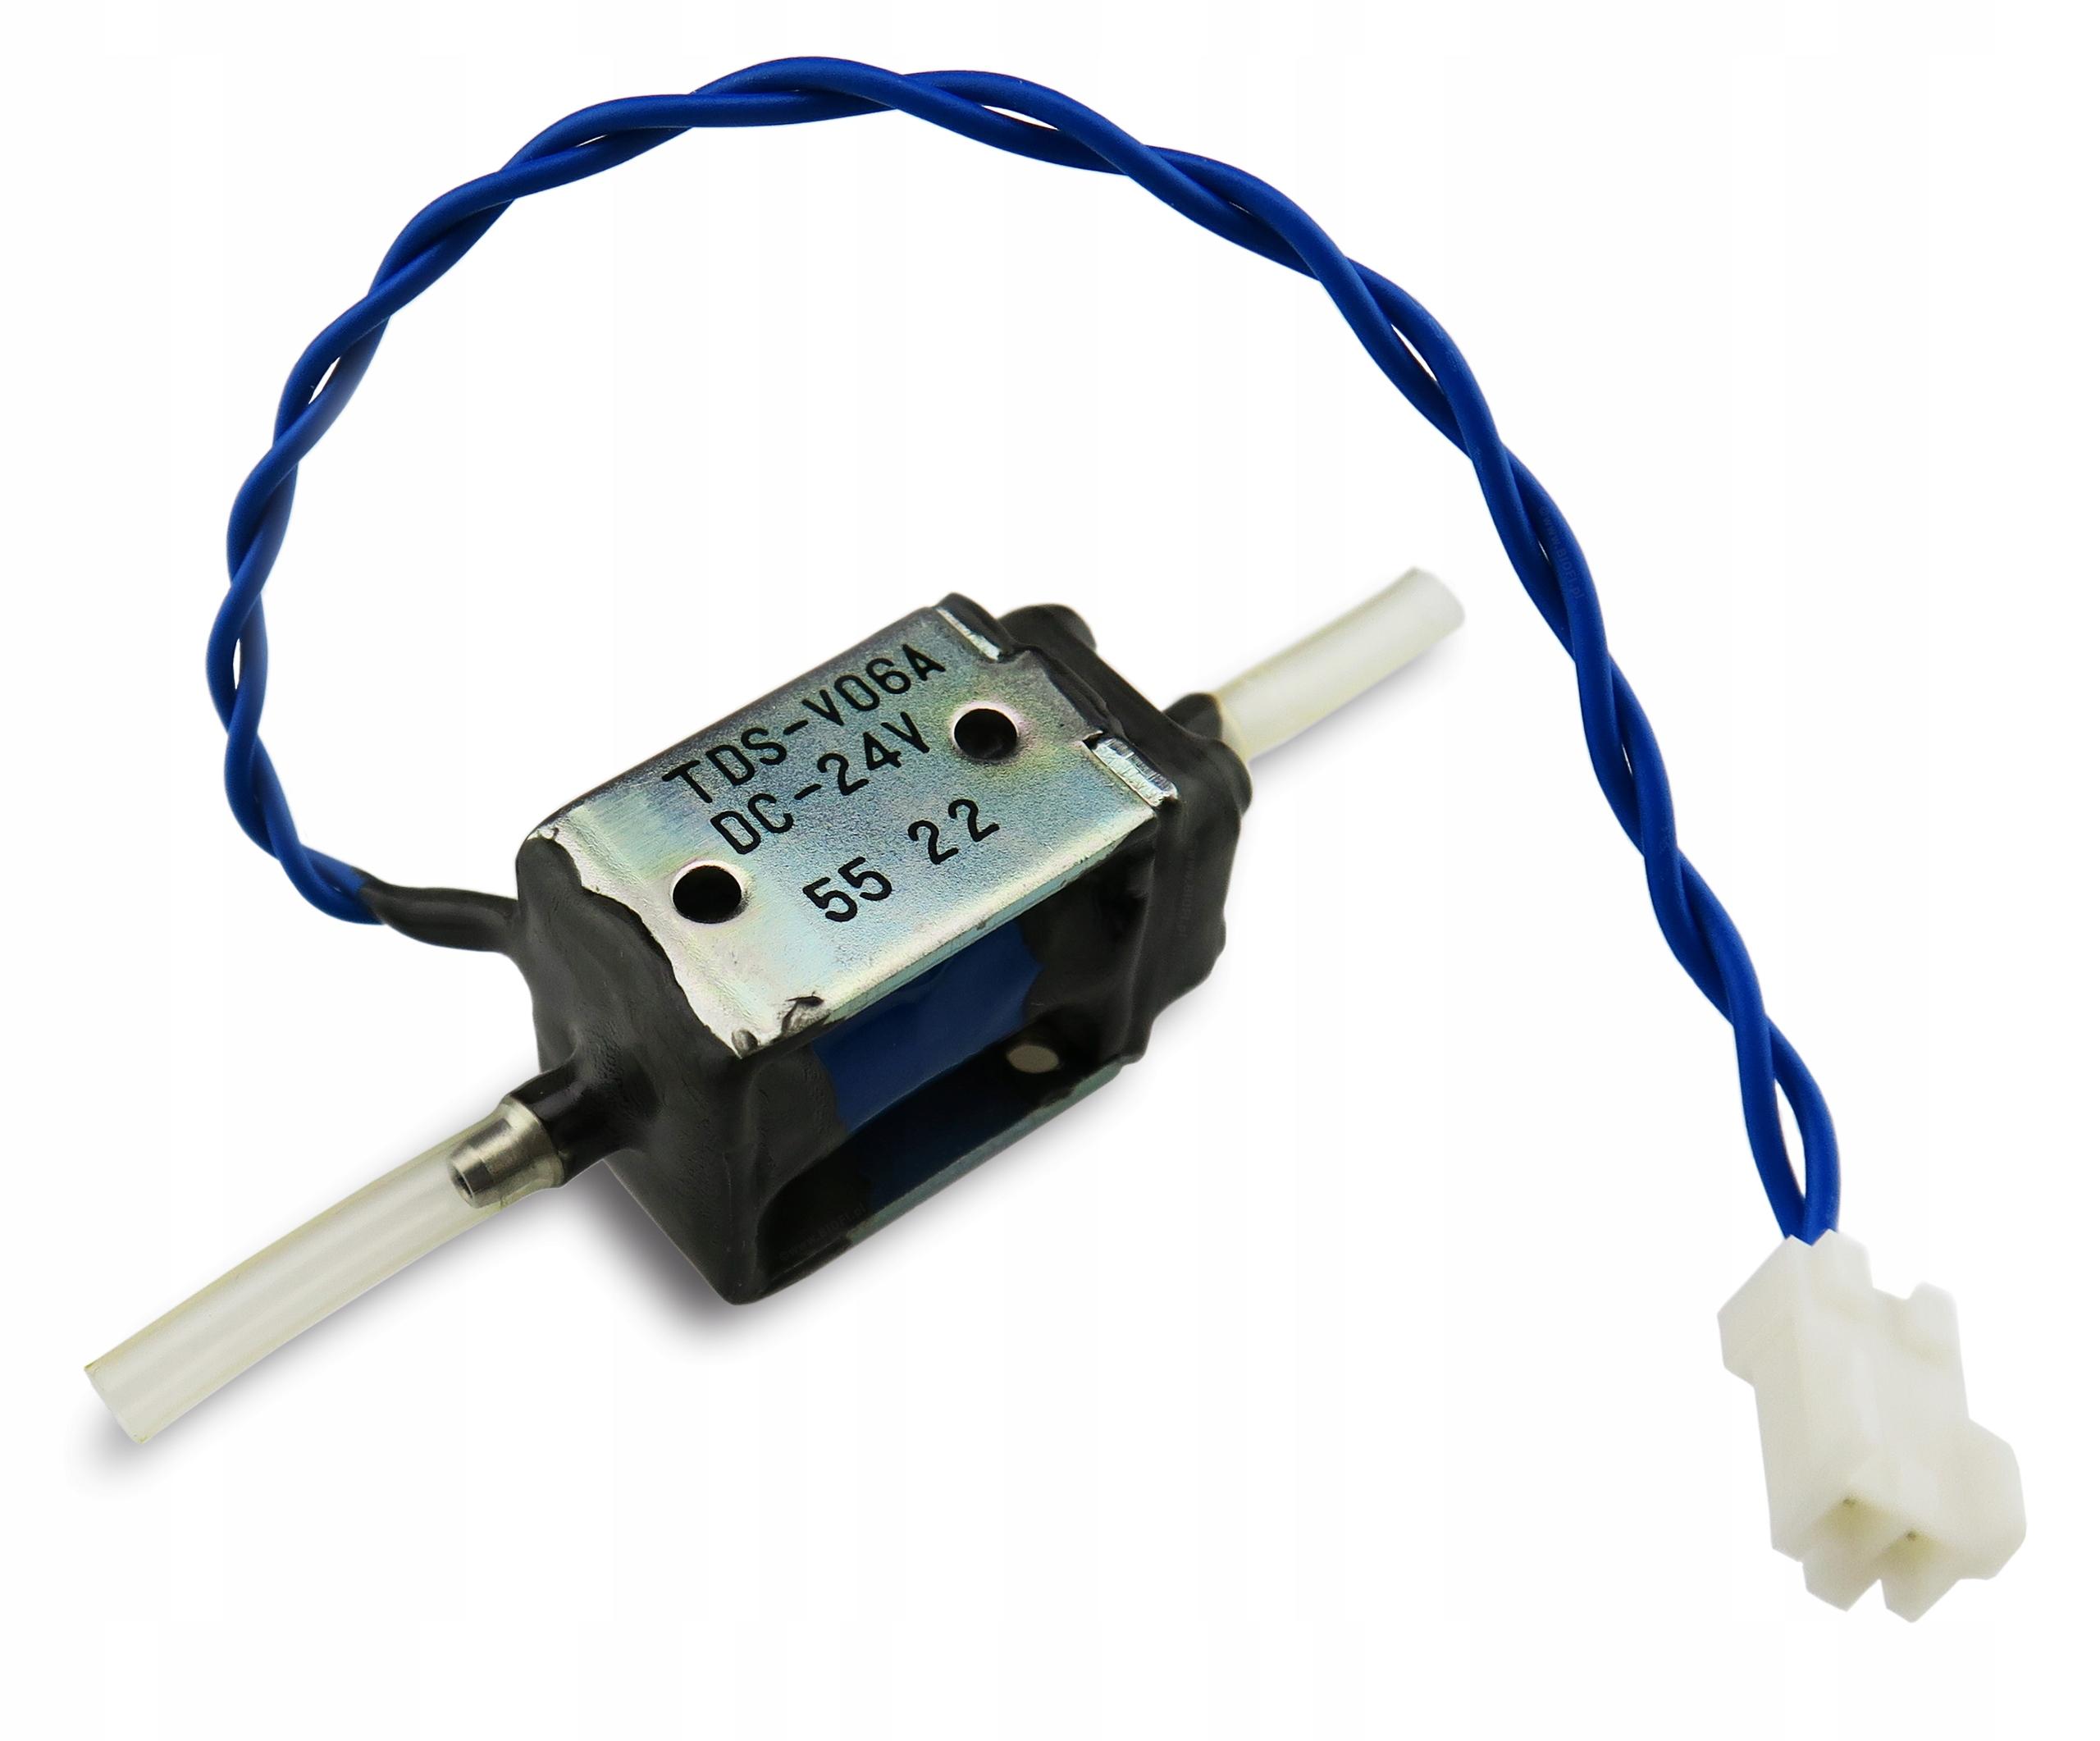 Atramentový elektromagnetický ventil - MUTOH DG-40679 2s